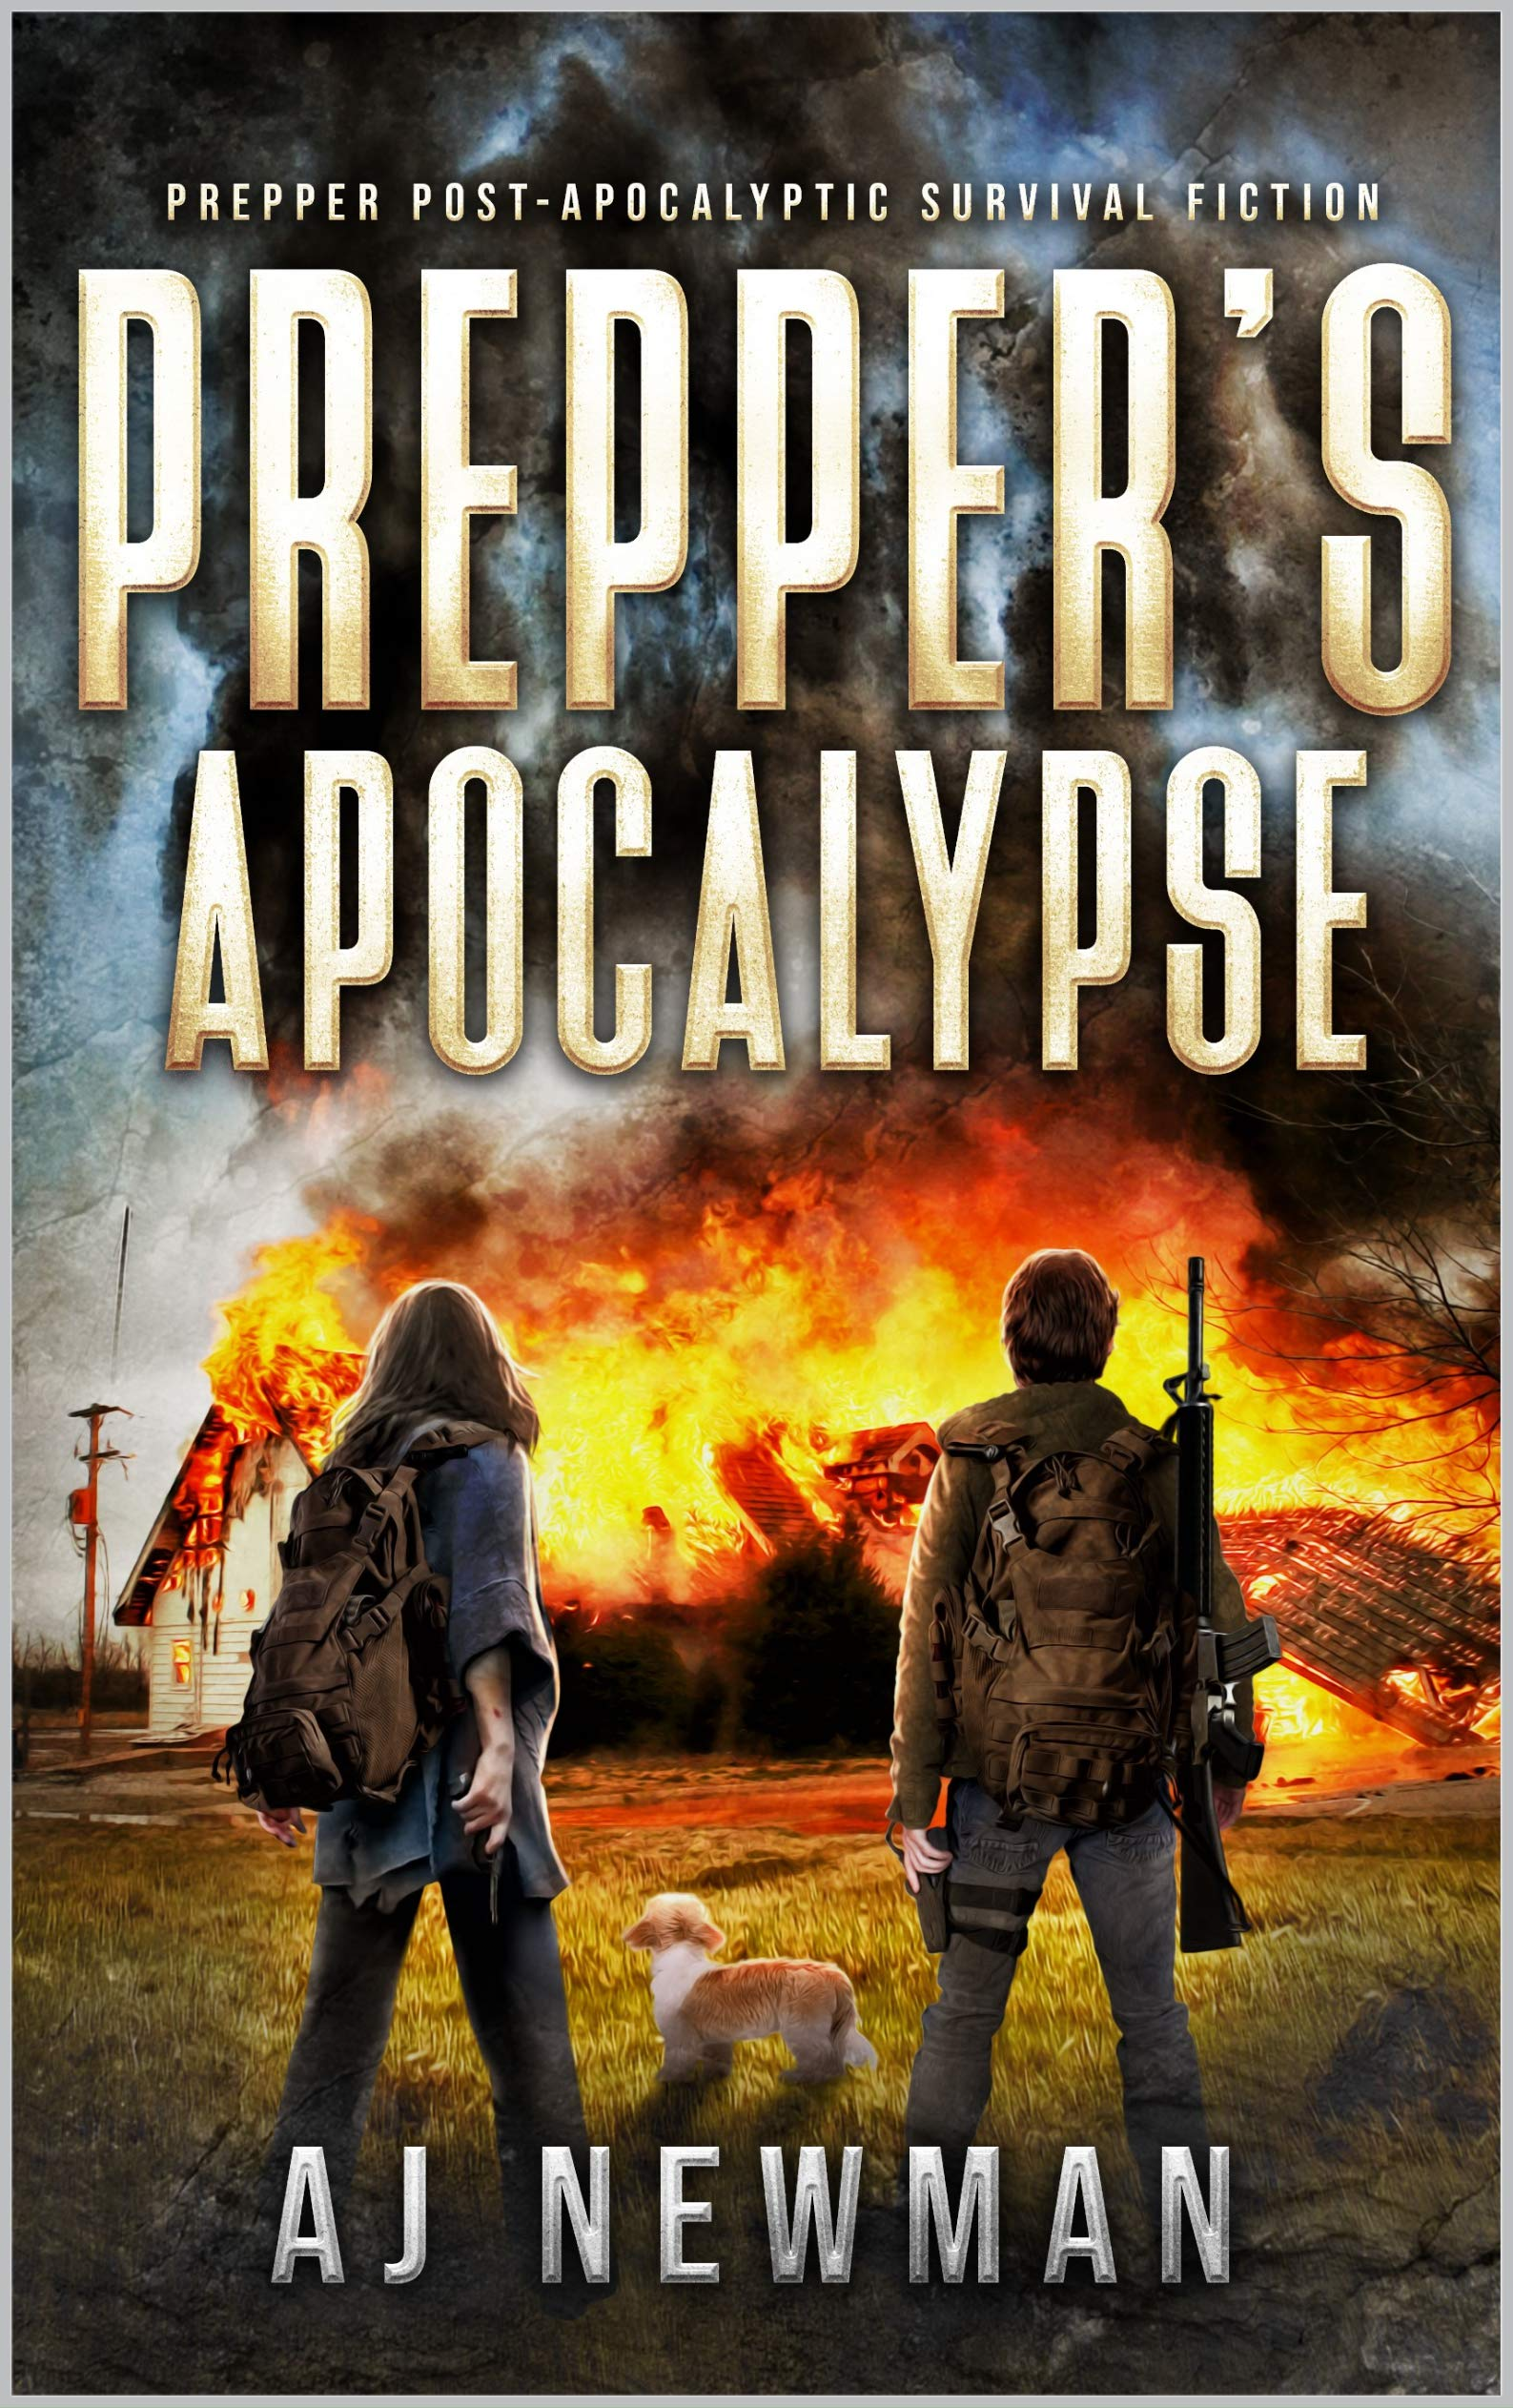 Prepper's Apocalypse